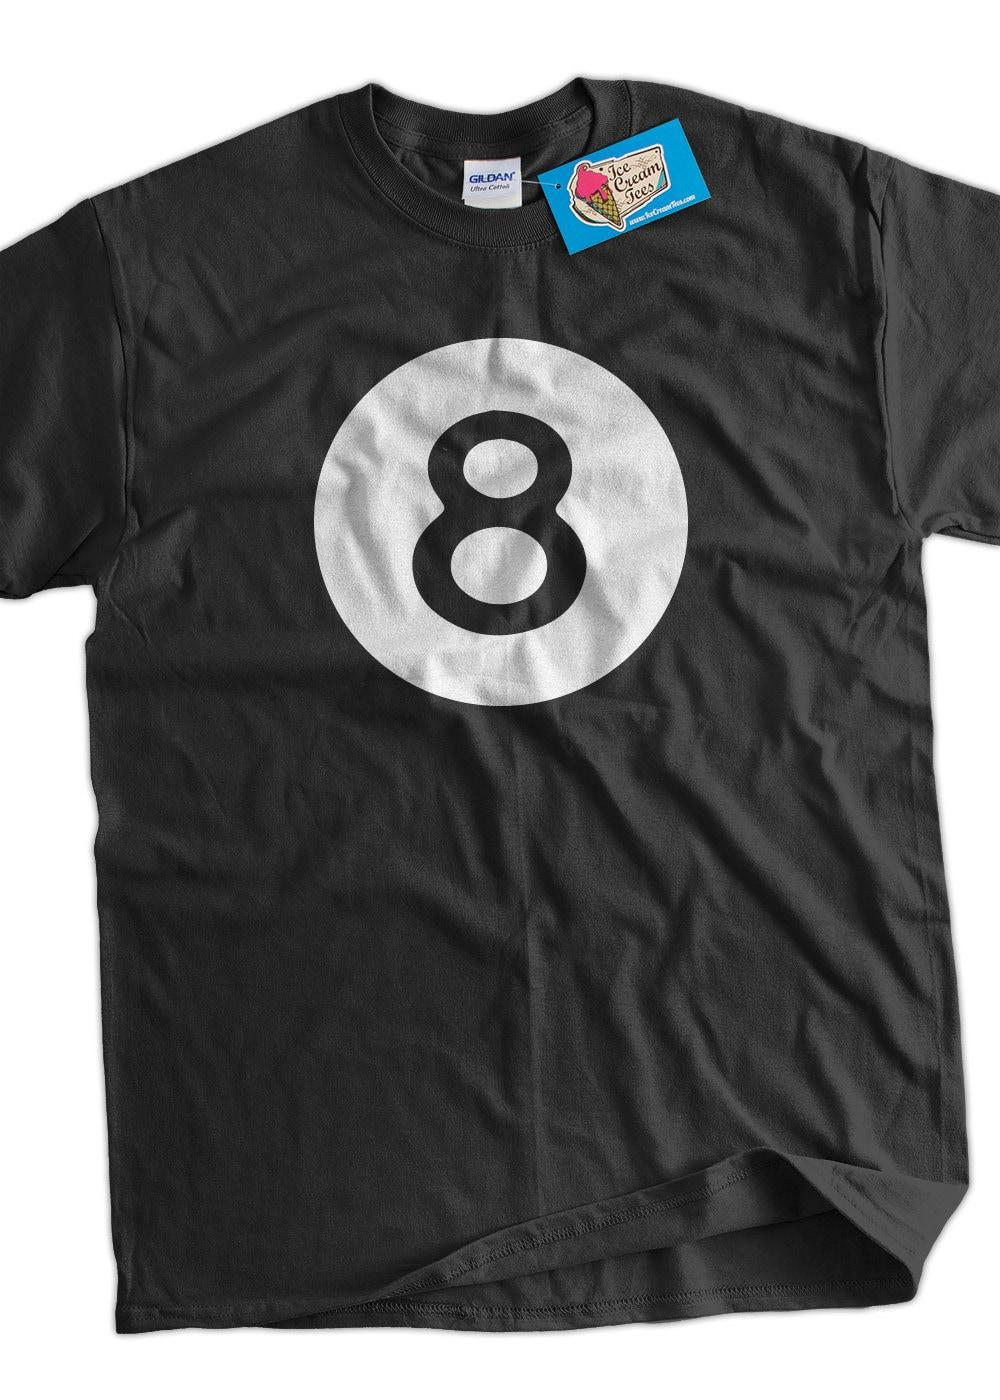 Funny 8 Ball T Shirt Magic Eight Ball Billiards Pool League